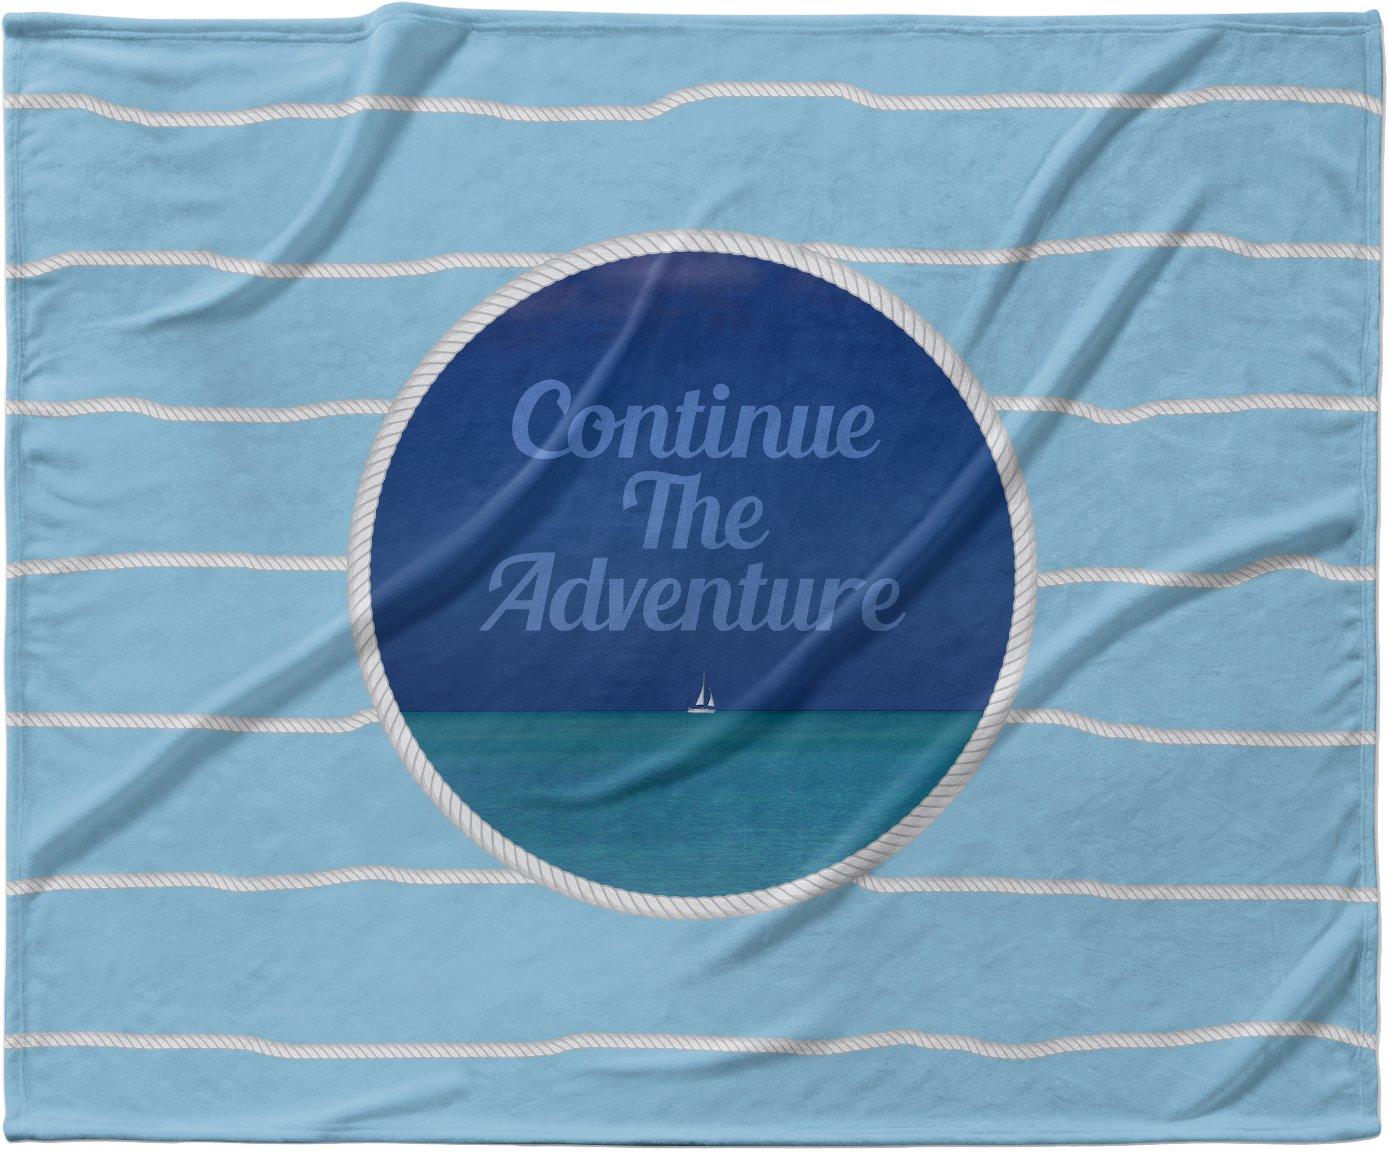 KESS InHouse Deepti Munshaw 'Continue The Adventure' Blue Aqua Fleece Baby Blanket, 40' x 30'